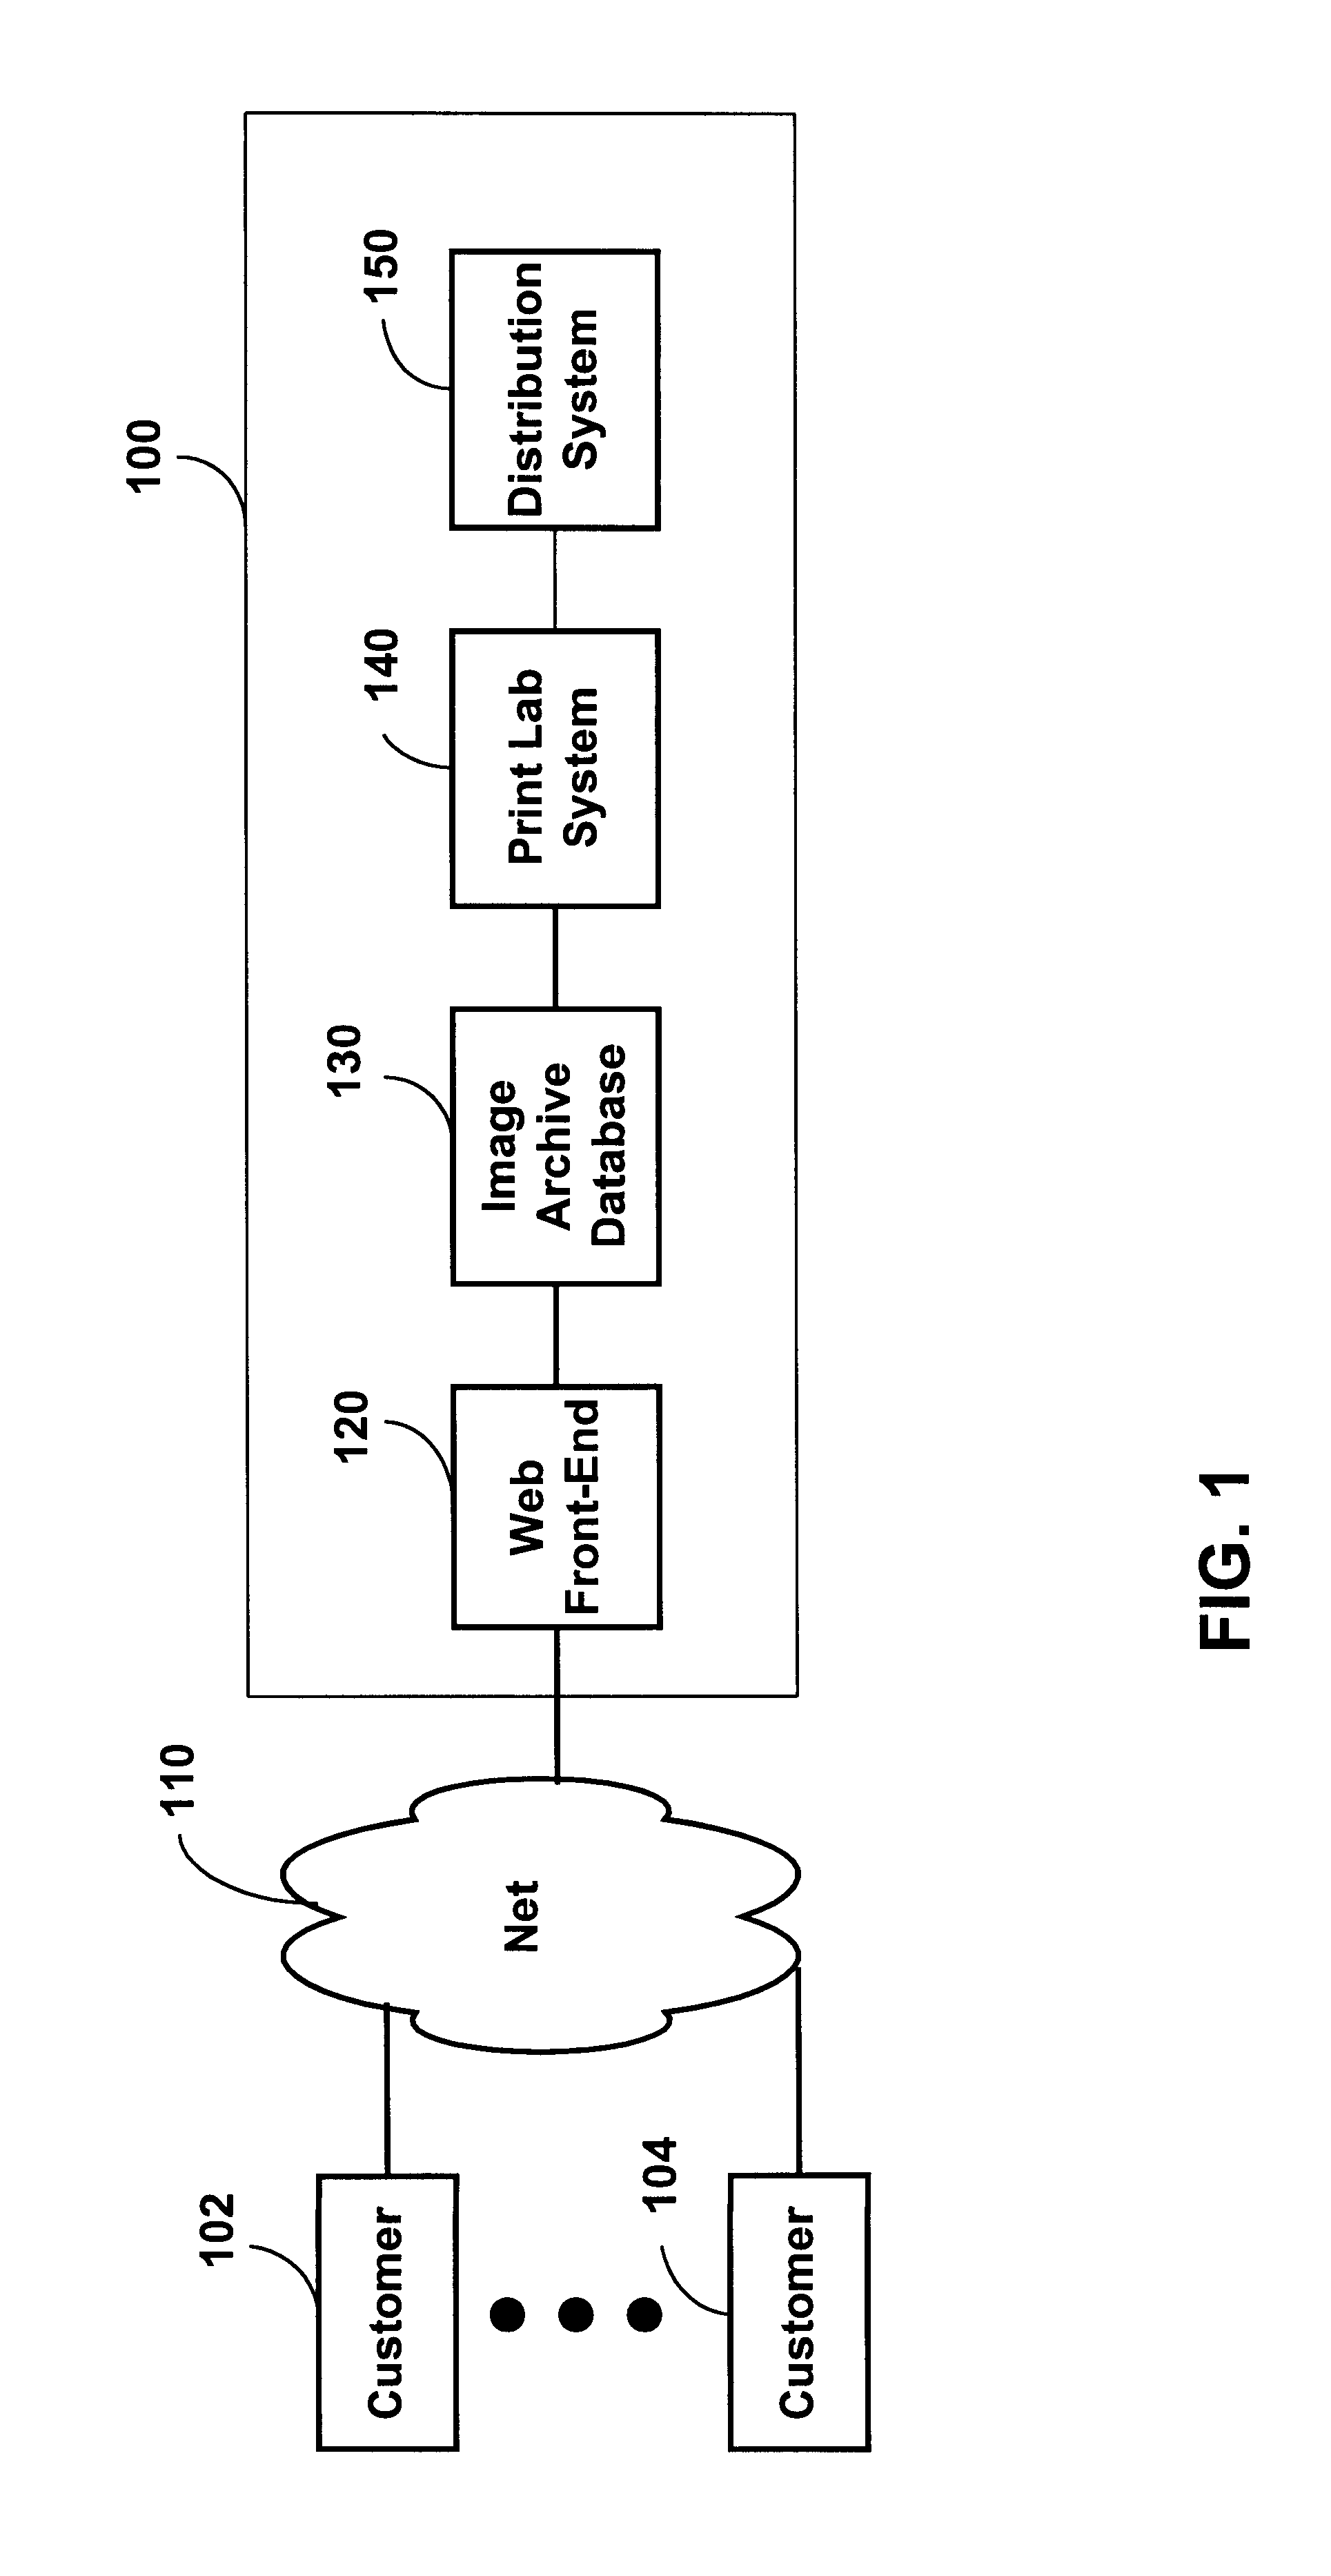 Data Storage System : Patent us multi tier data storage system google